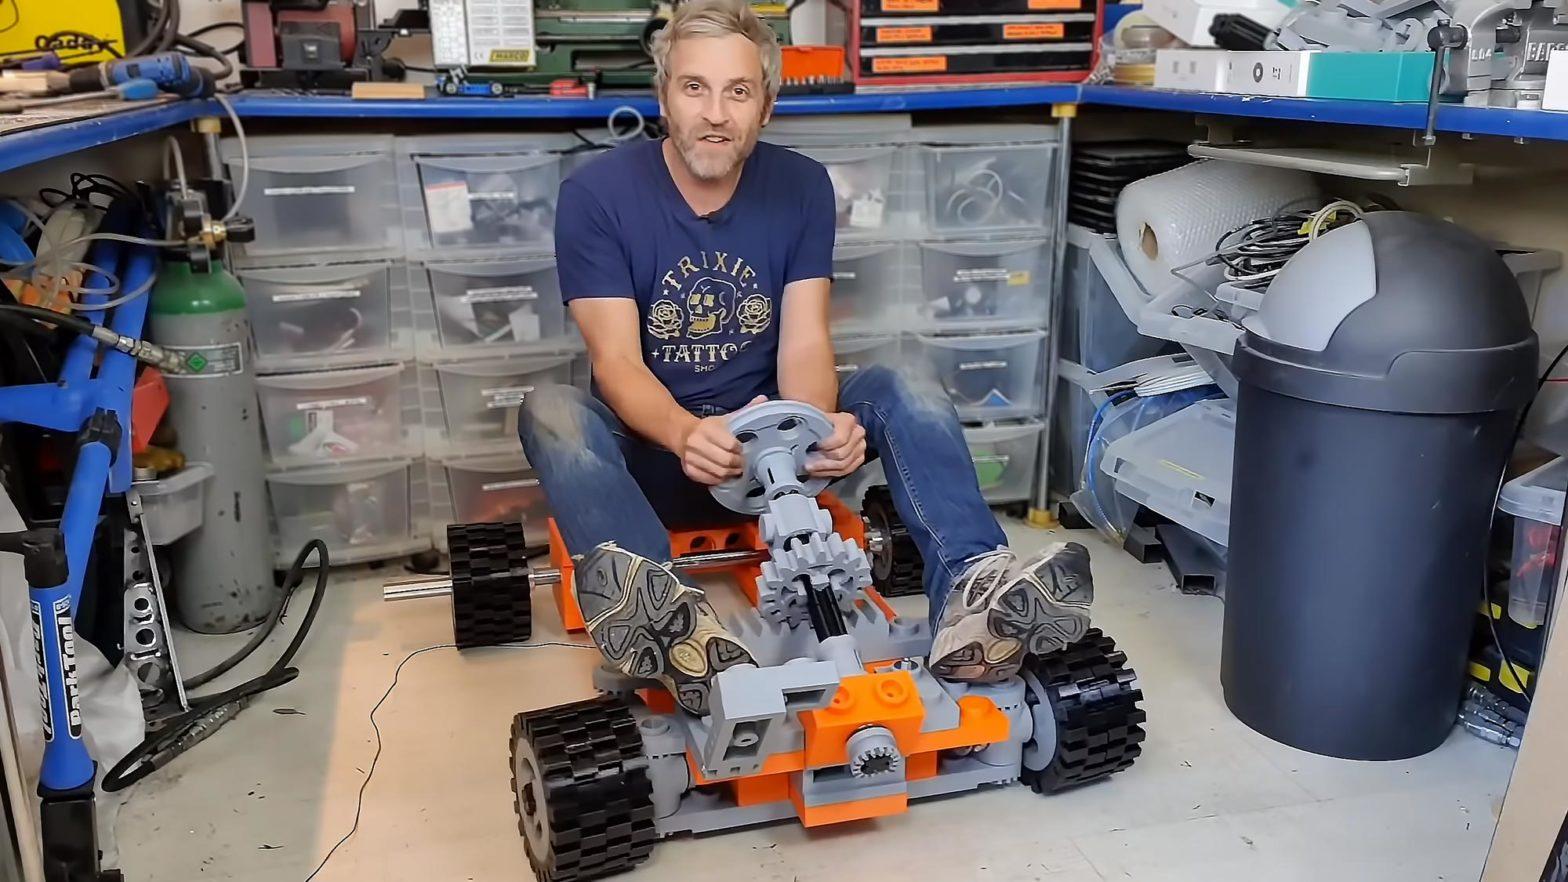 XXL 3D Printed LEGO Go-Kart by Matt Denton